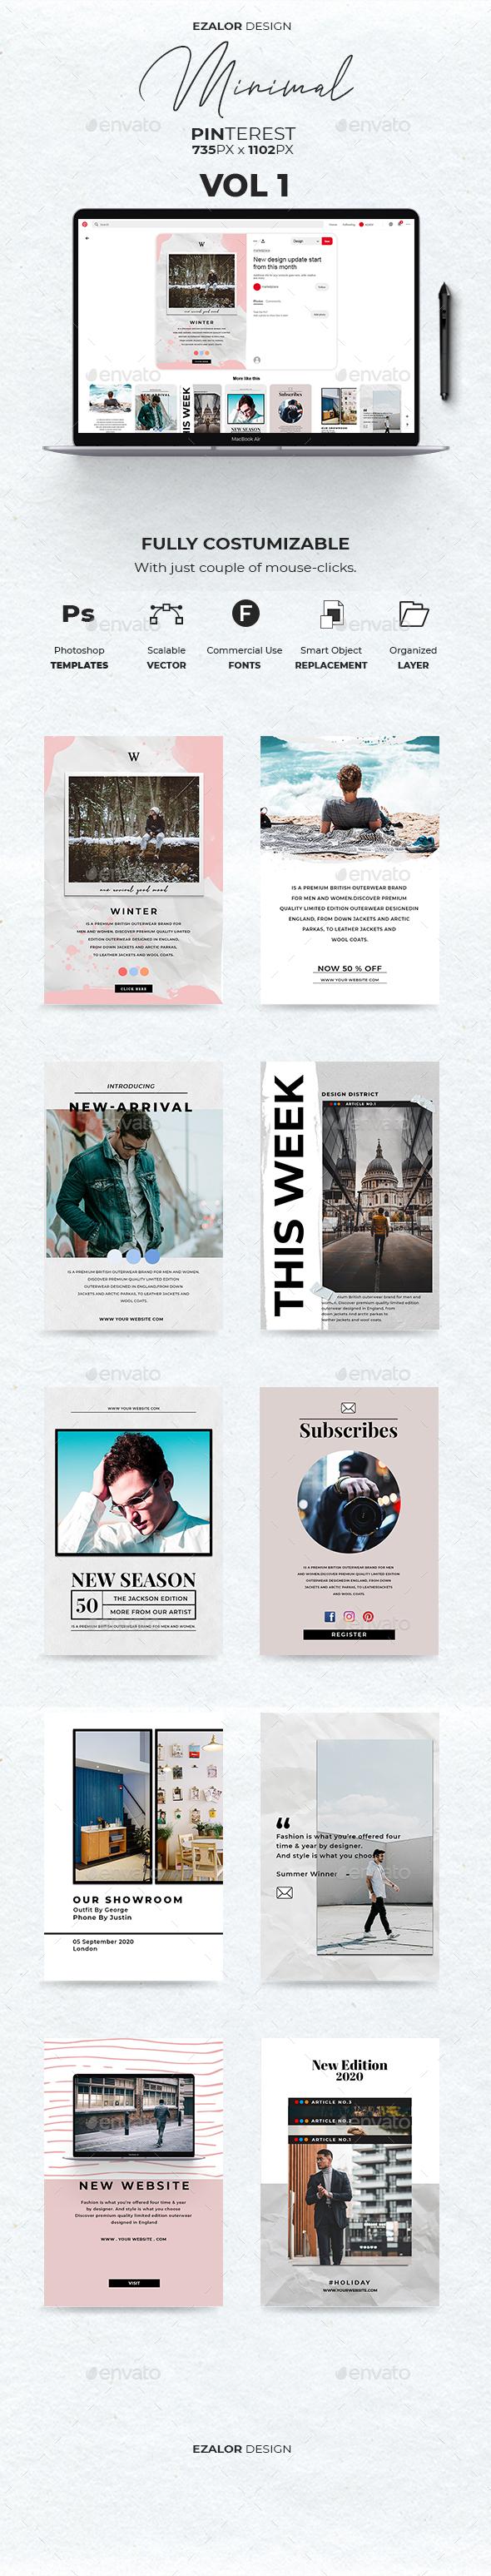 12 Pinterest Fashion Graphics, Designs & Templates